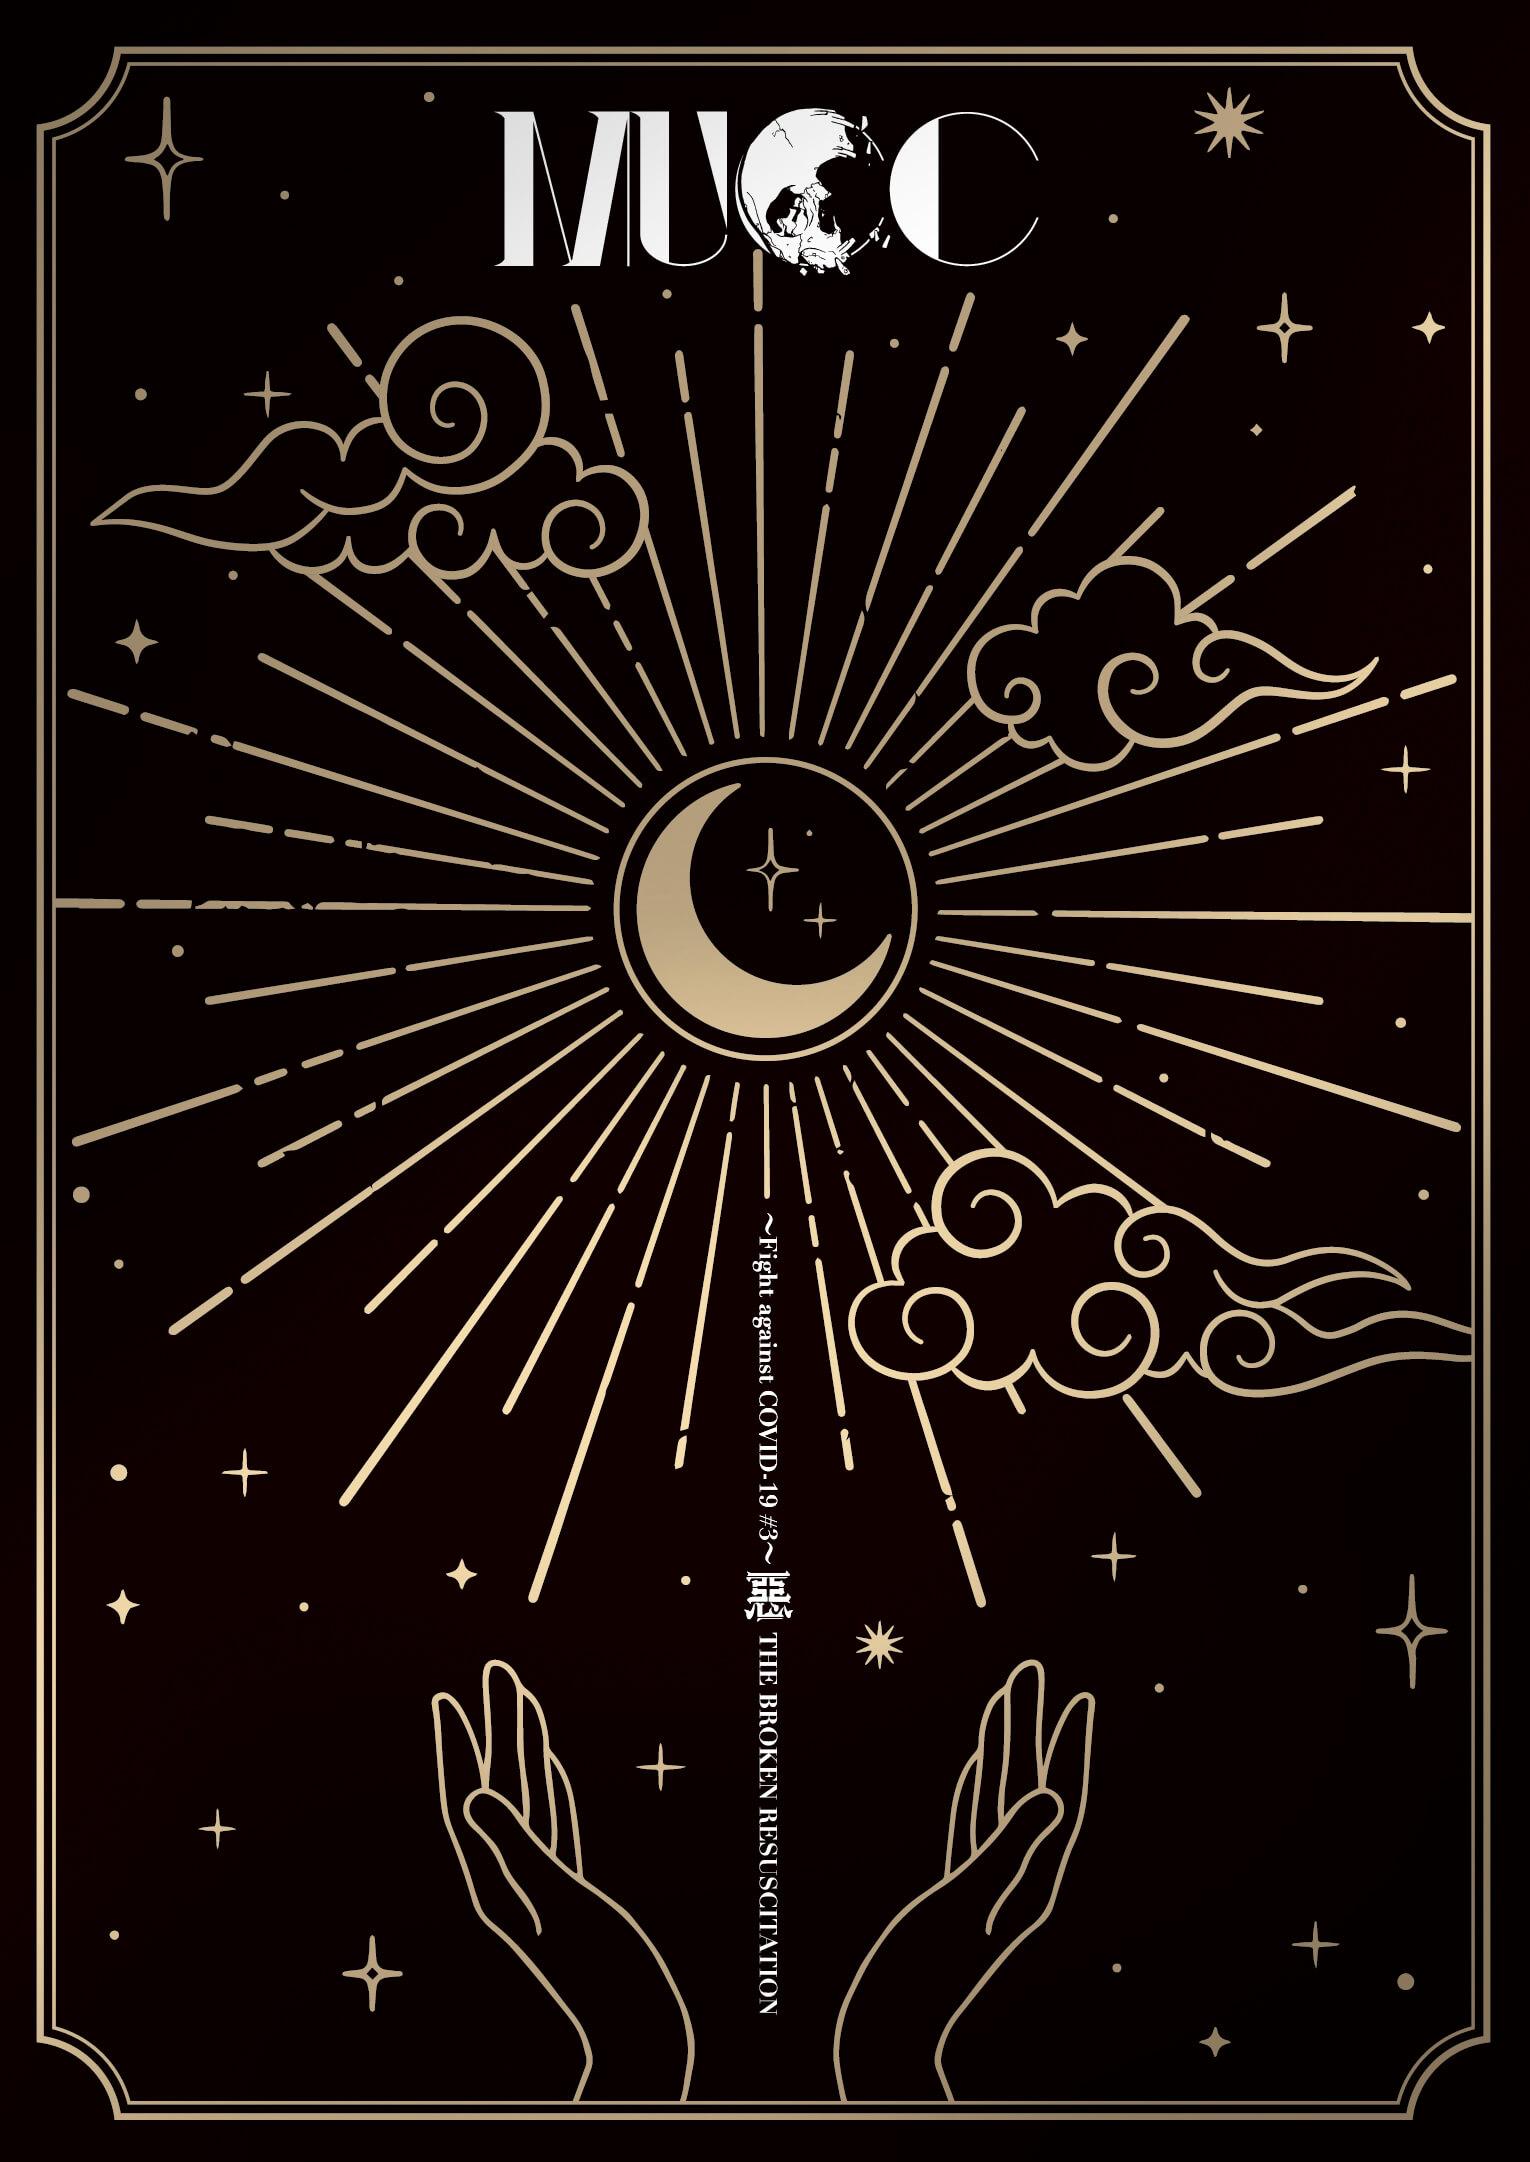 【anysee.jp限定!】  MUCCオリジナルBOXティッシュ特典付き!  MUCC【~Fight against COVID-19 #3~『惡-THE BROKEN RESUSCITATION』】DVD